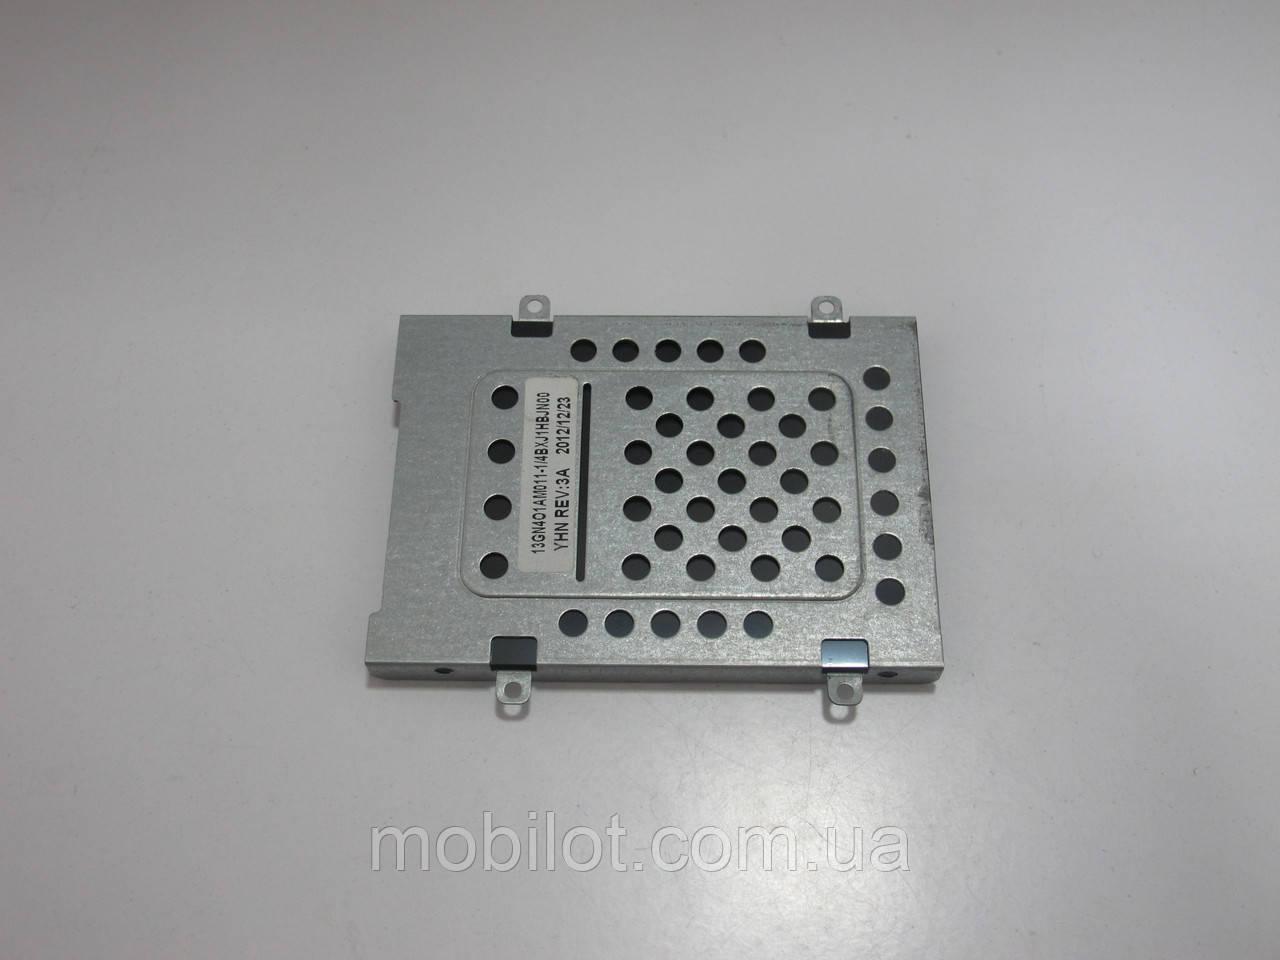 Корпус (карман, корзина, крепление) для HDD Asus X501 (NZ-4139)